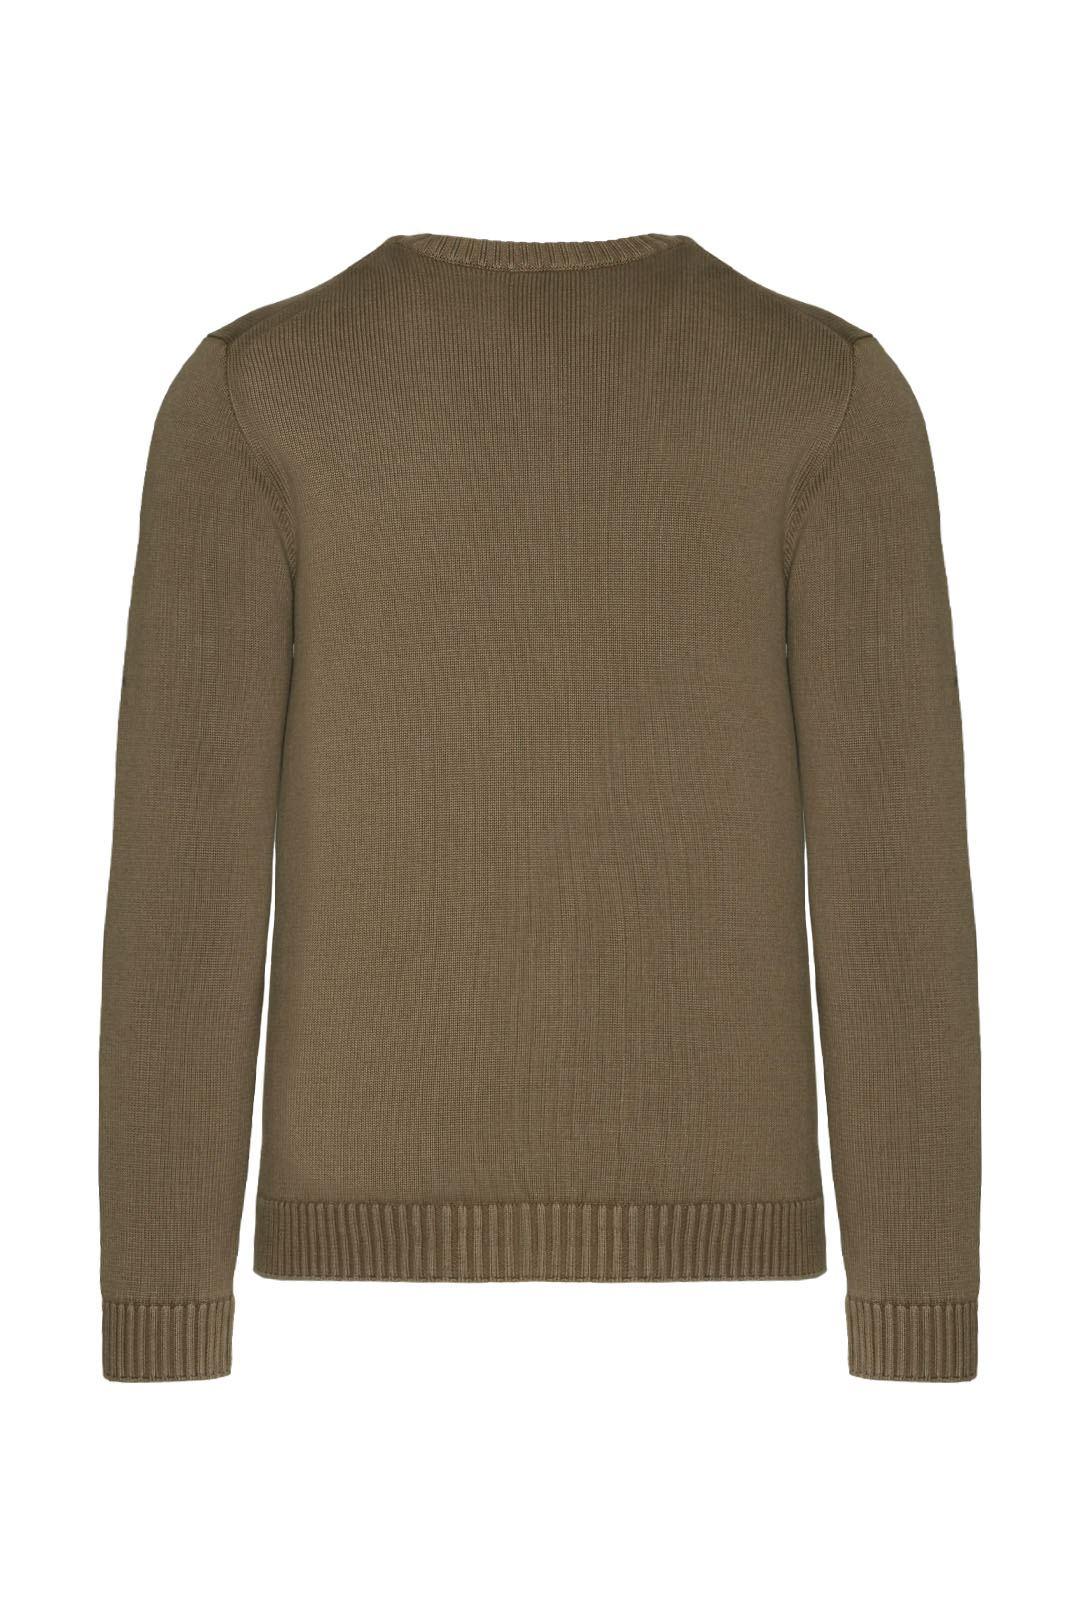 Printed crewneck cotton sweater          2